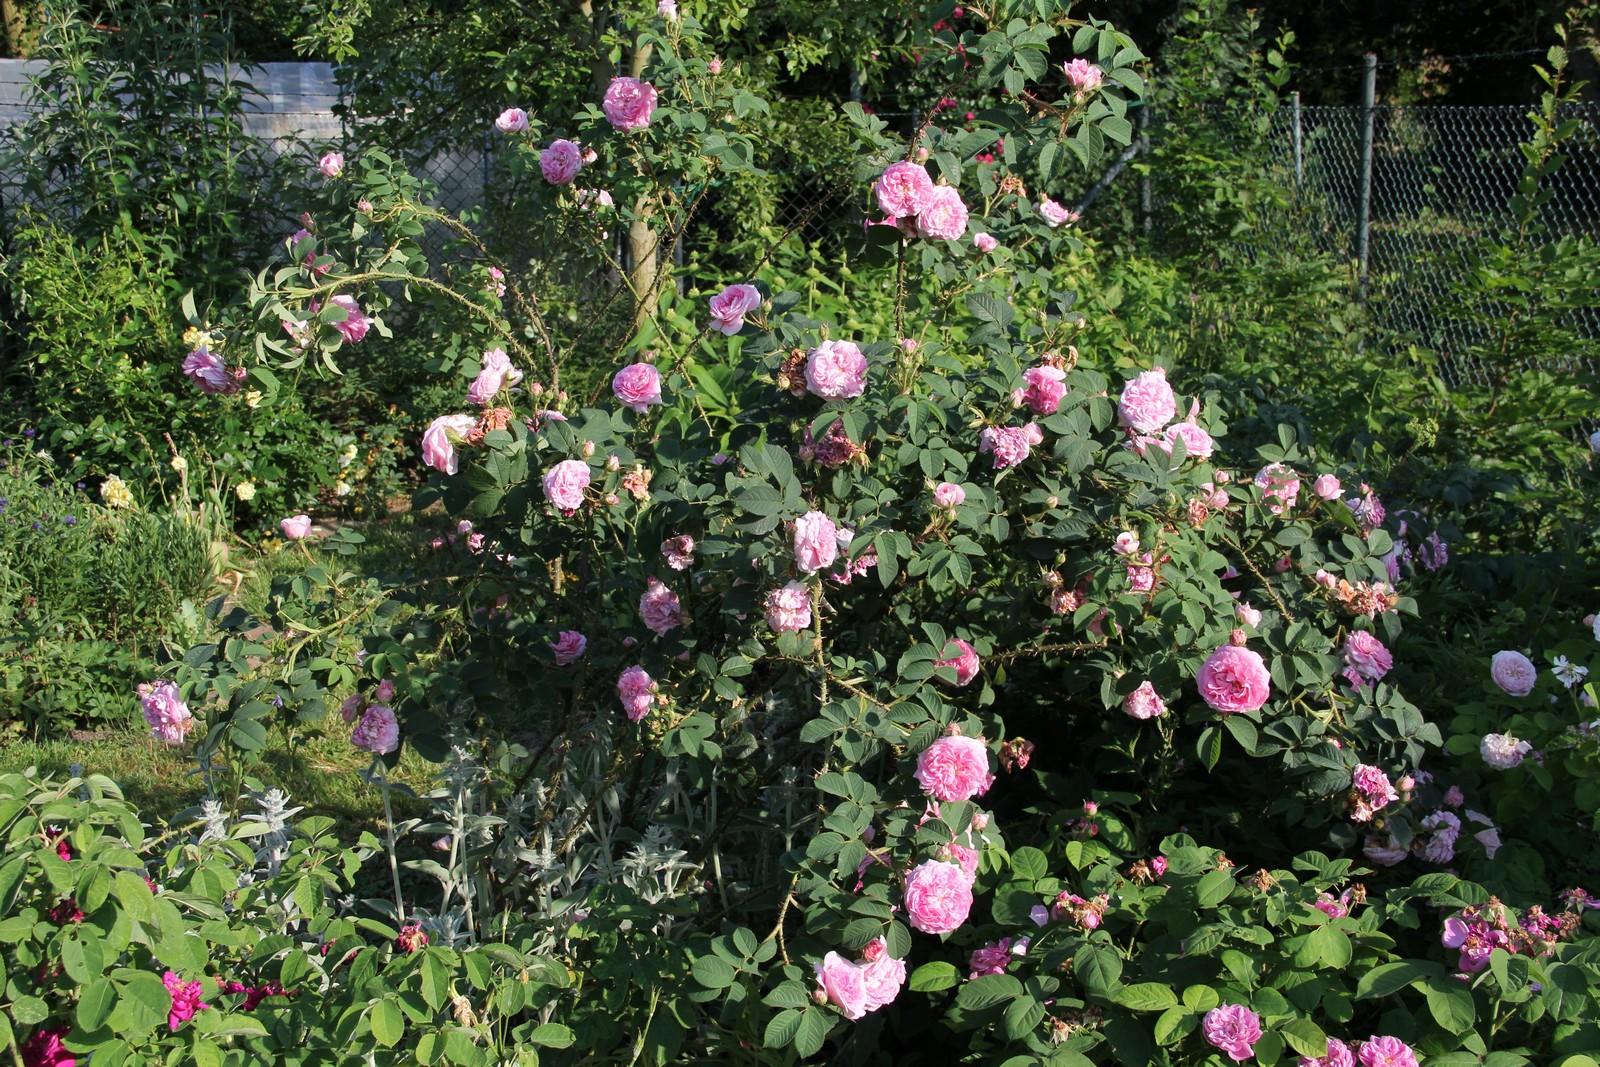 Rosa x alba Königin von Dänemark